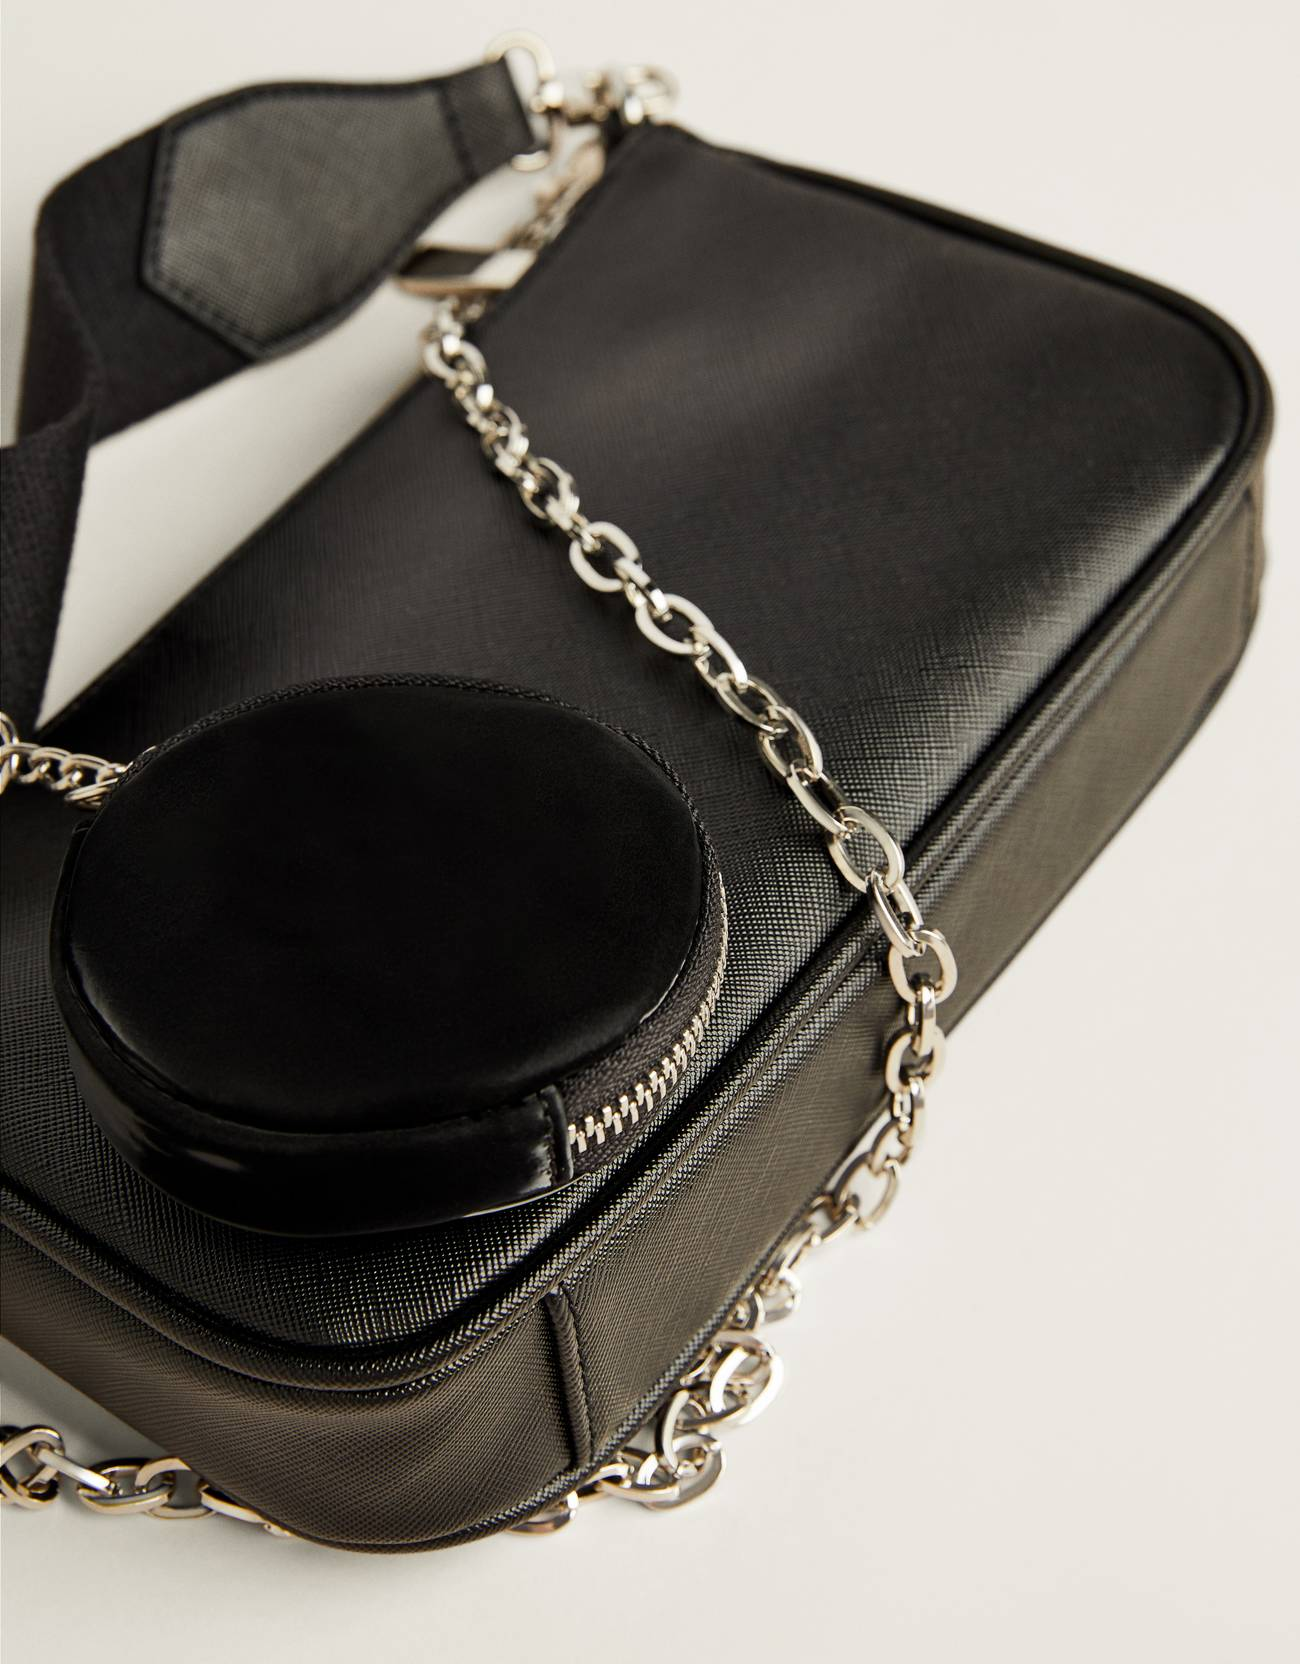 Bolso multipocket negra con cadena